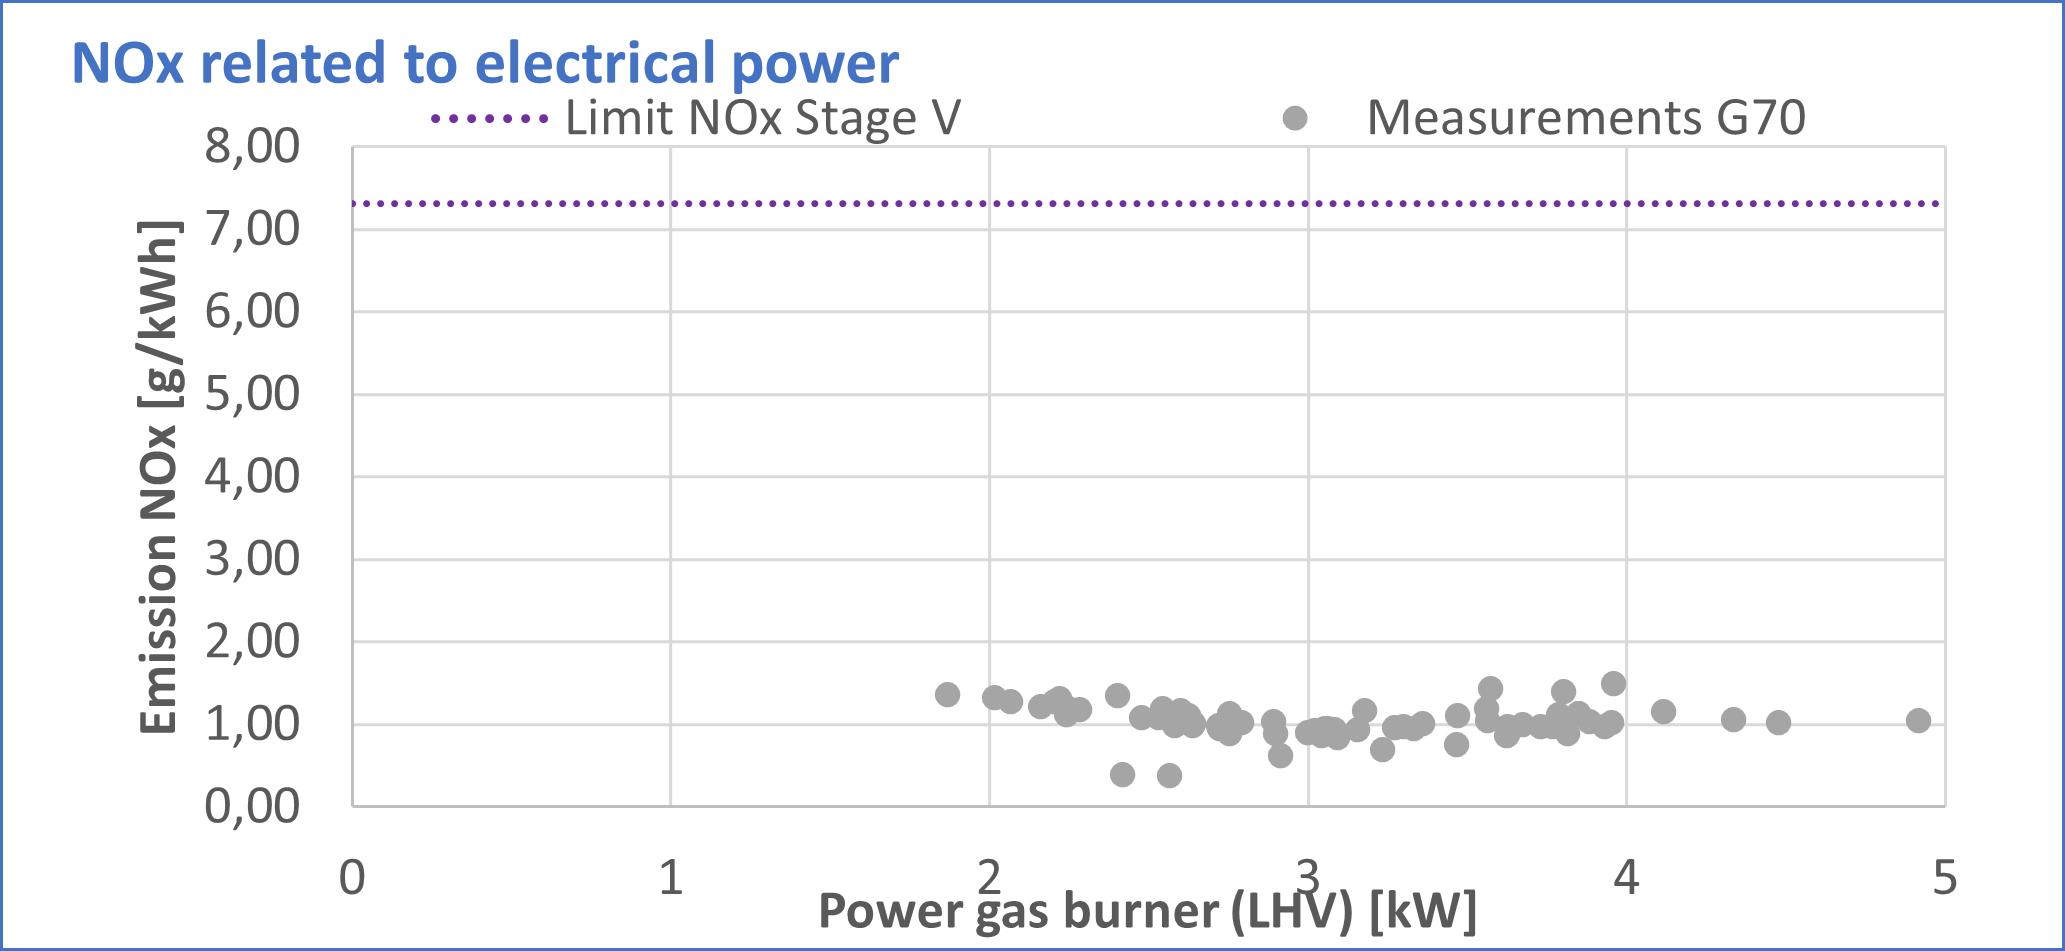 MobilGen G70 NOx Emissions